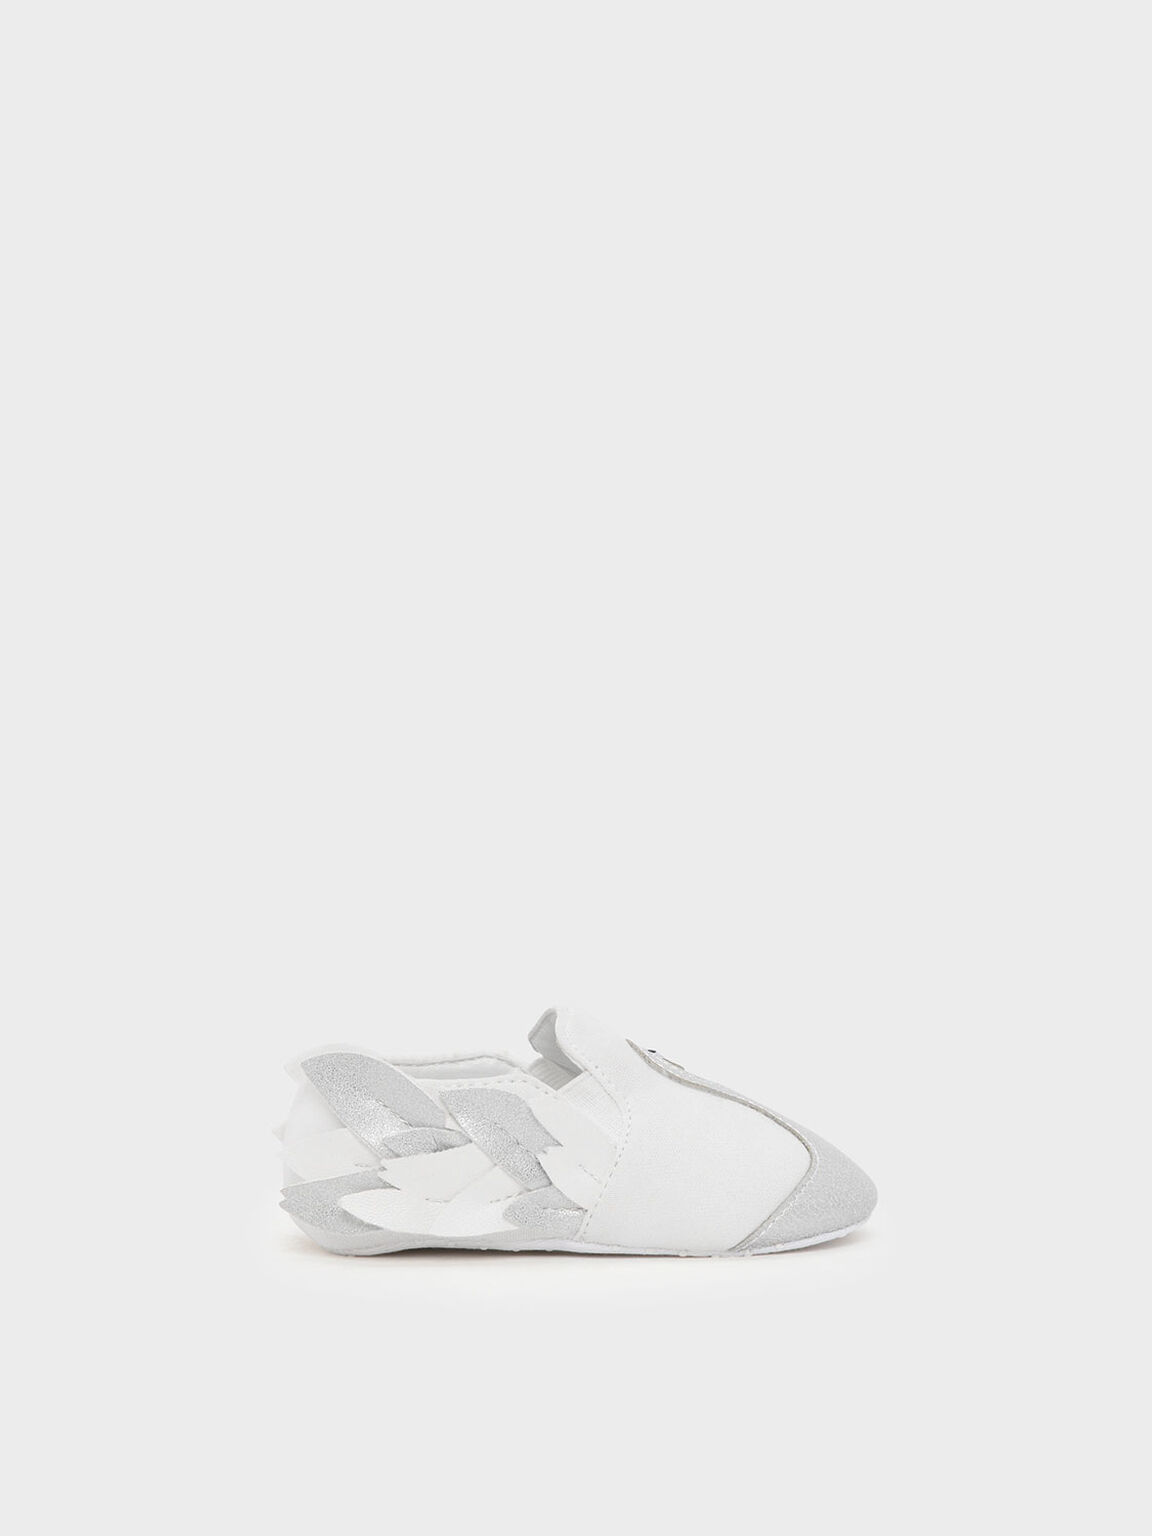 CHARLES & KEITH 鞋款低至34折優惠!:第3張圖片